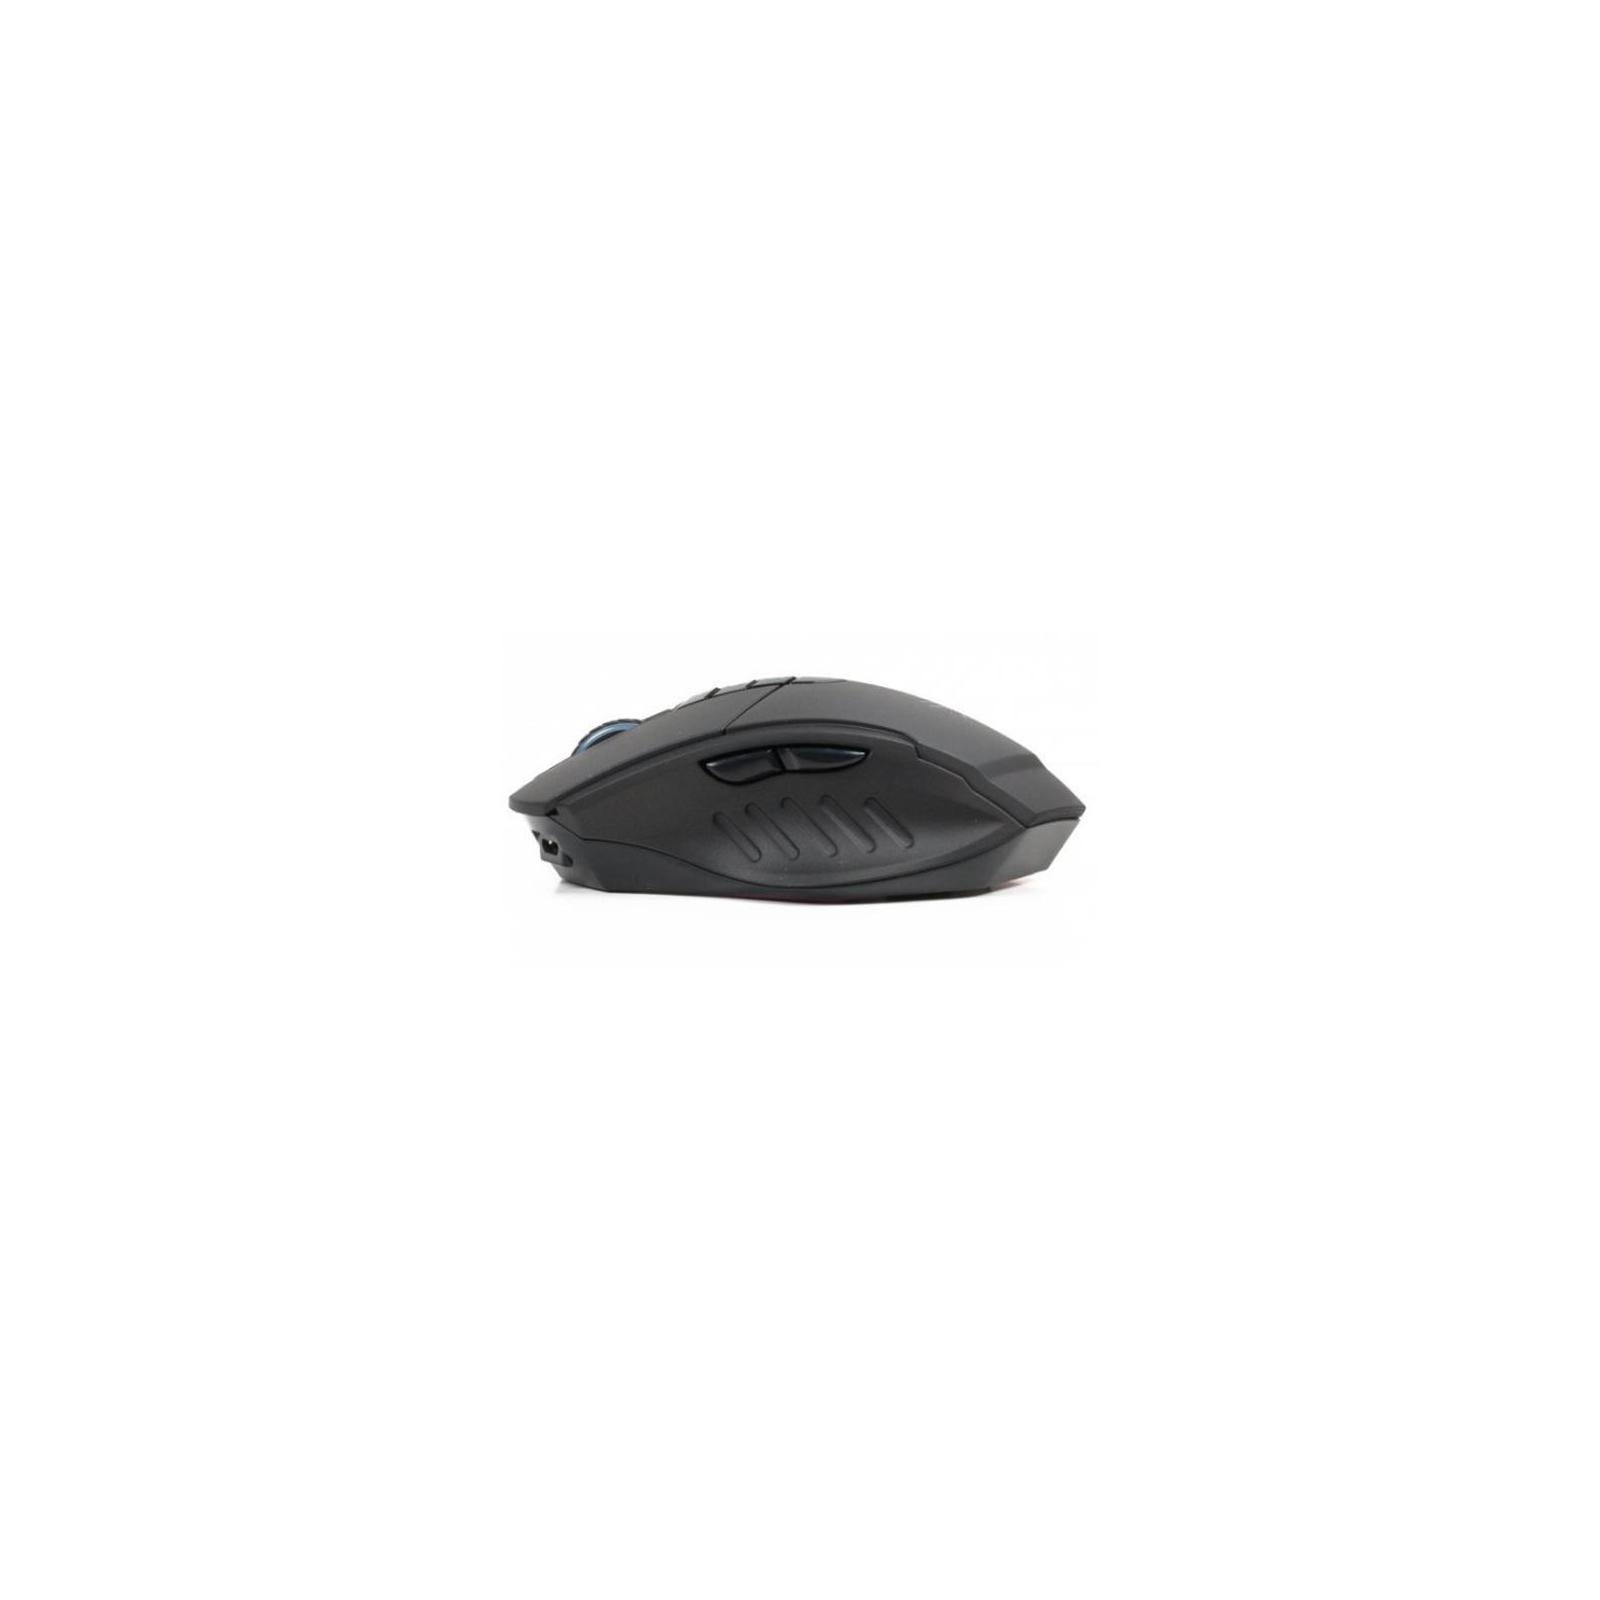 Мышка A4tech Bloody R70A Black изображение 5